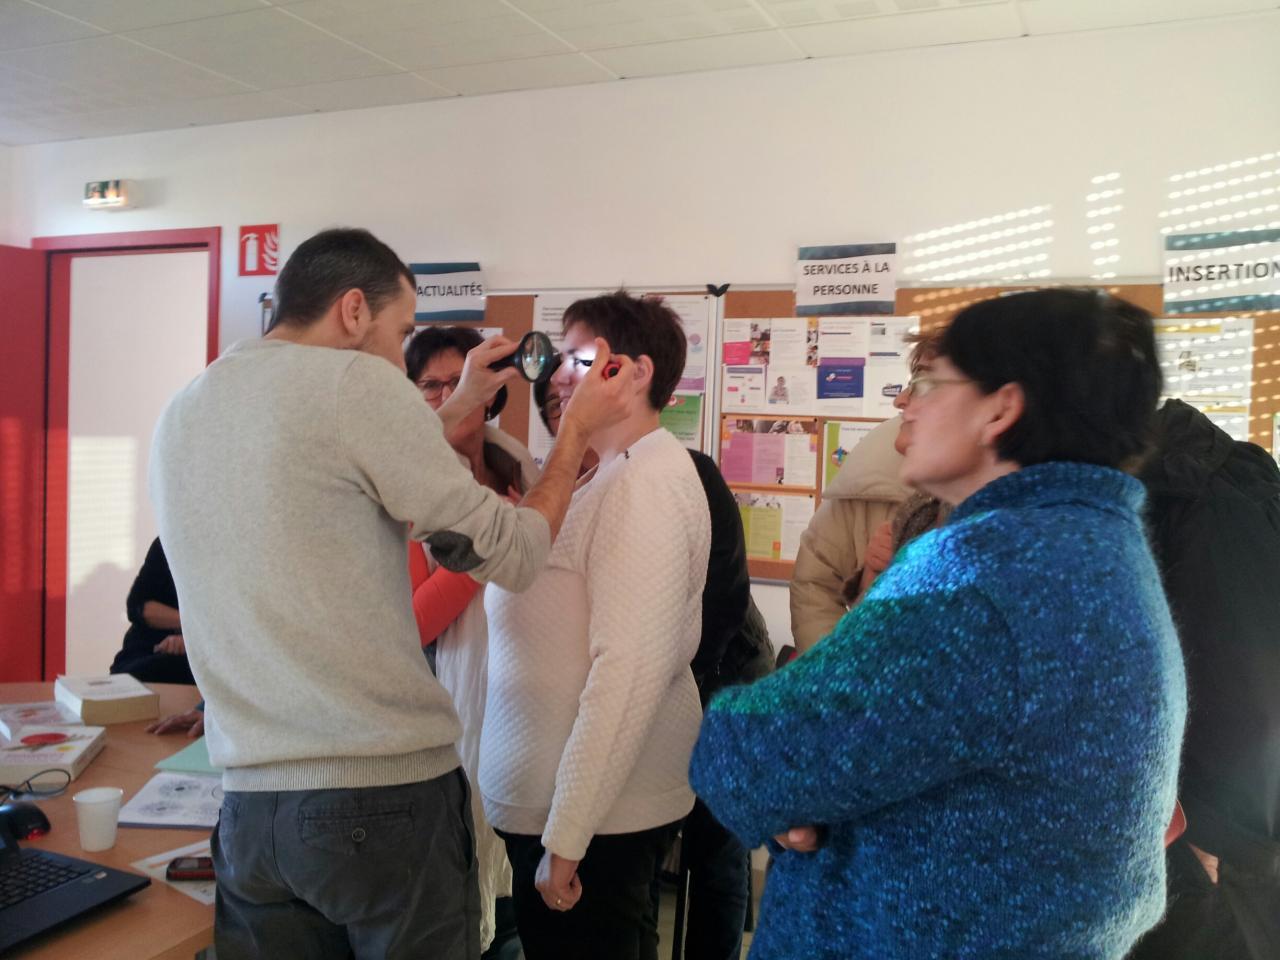 démonstration d'iridologie